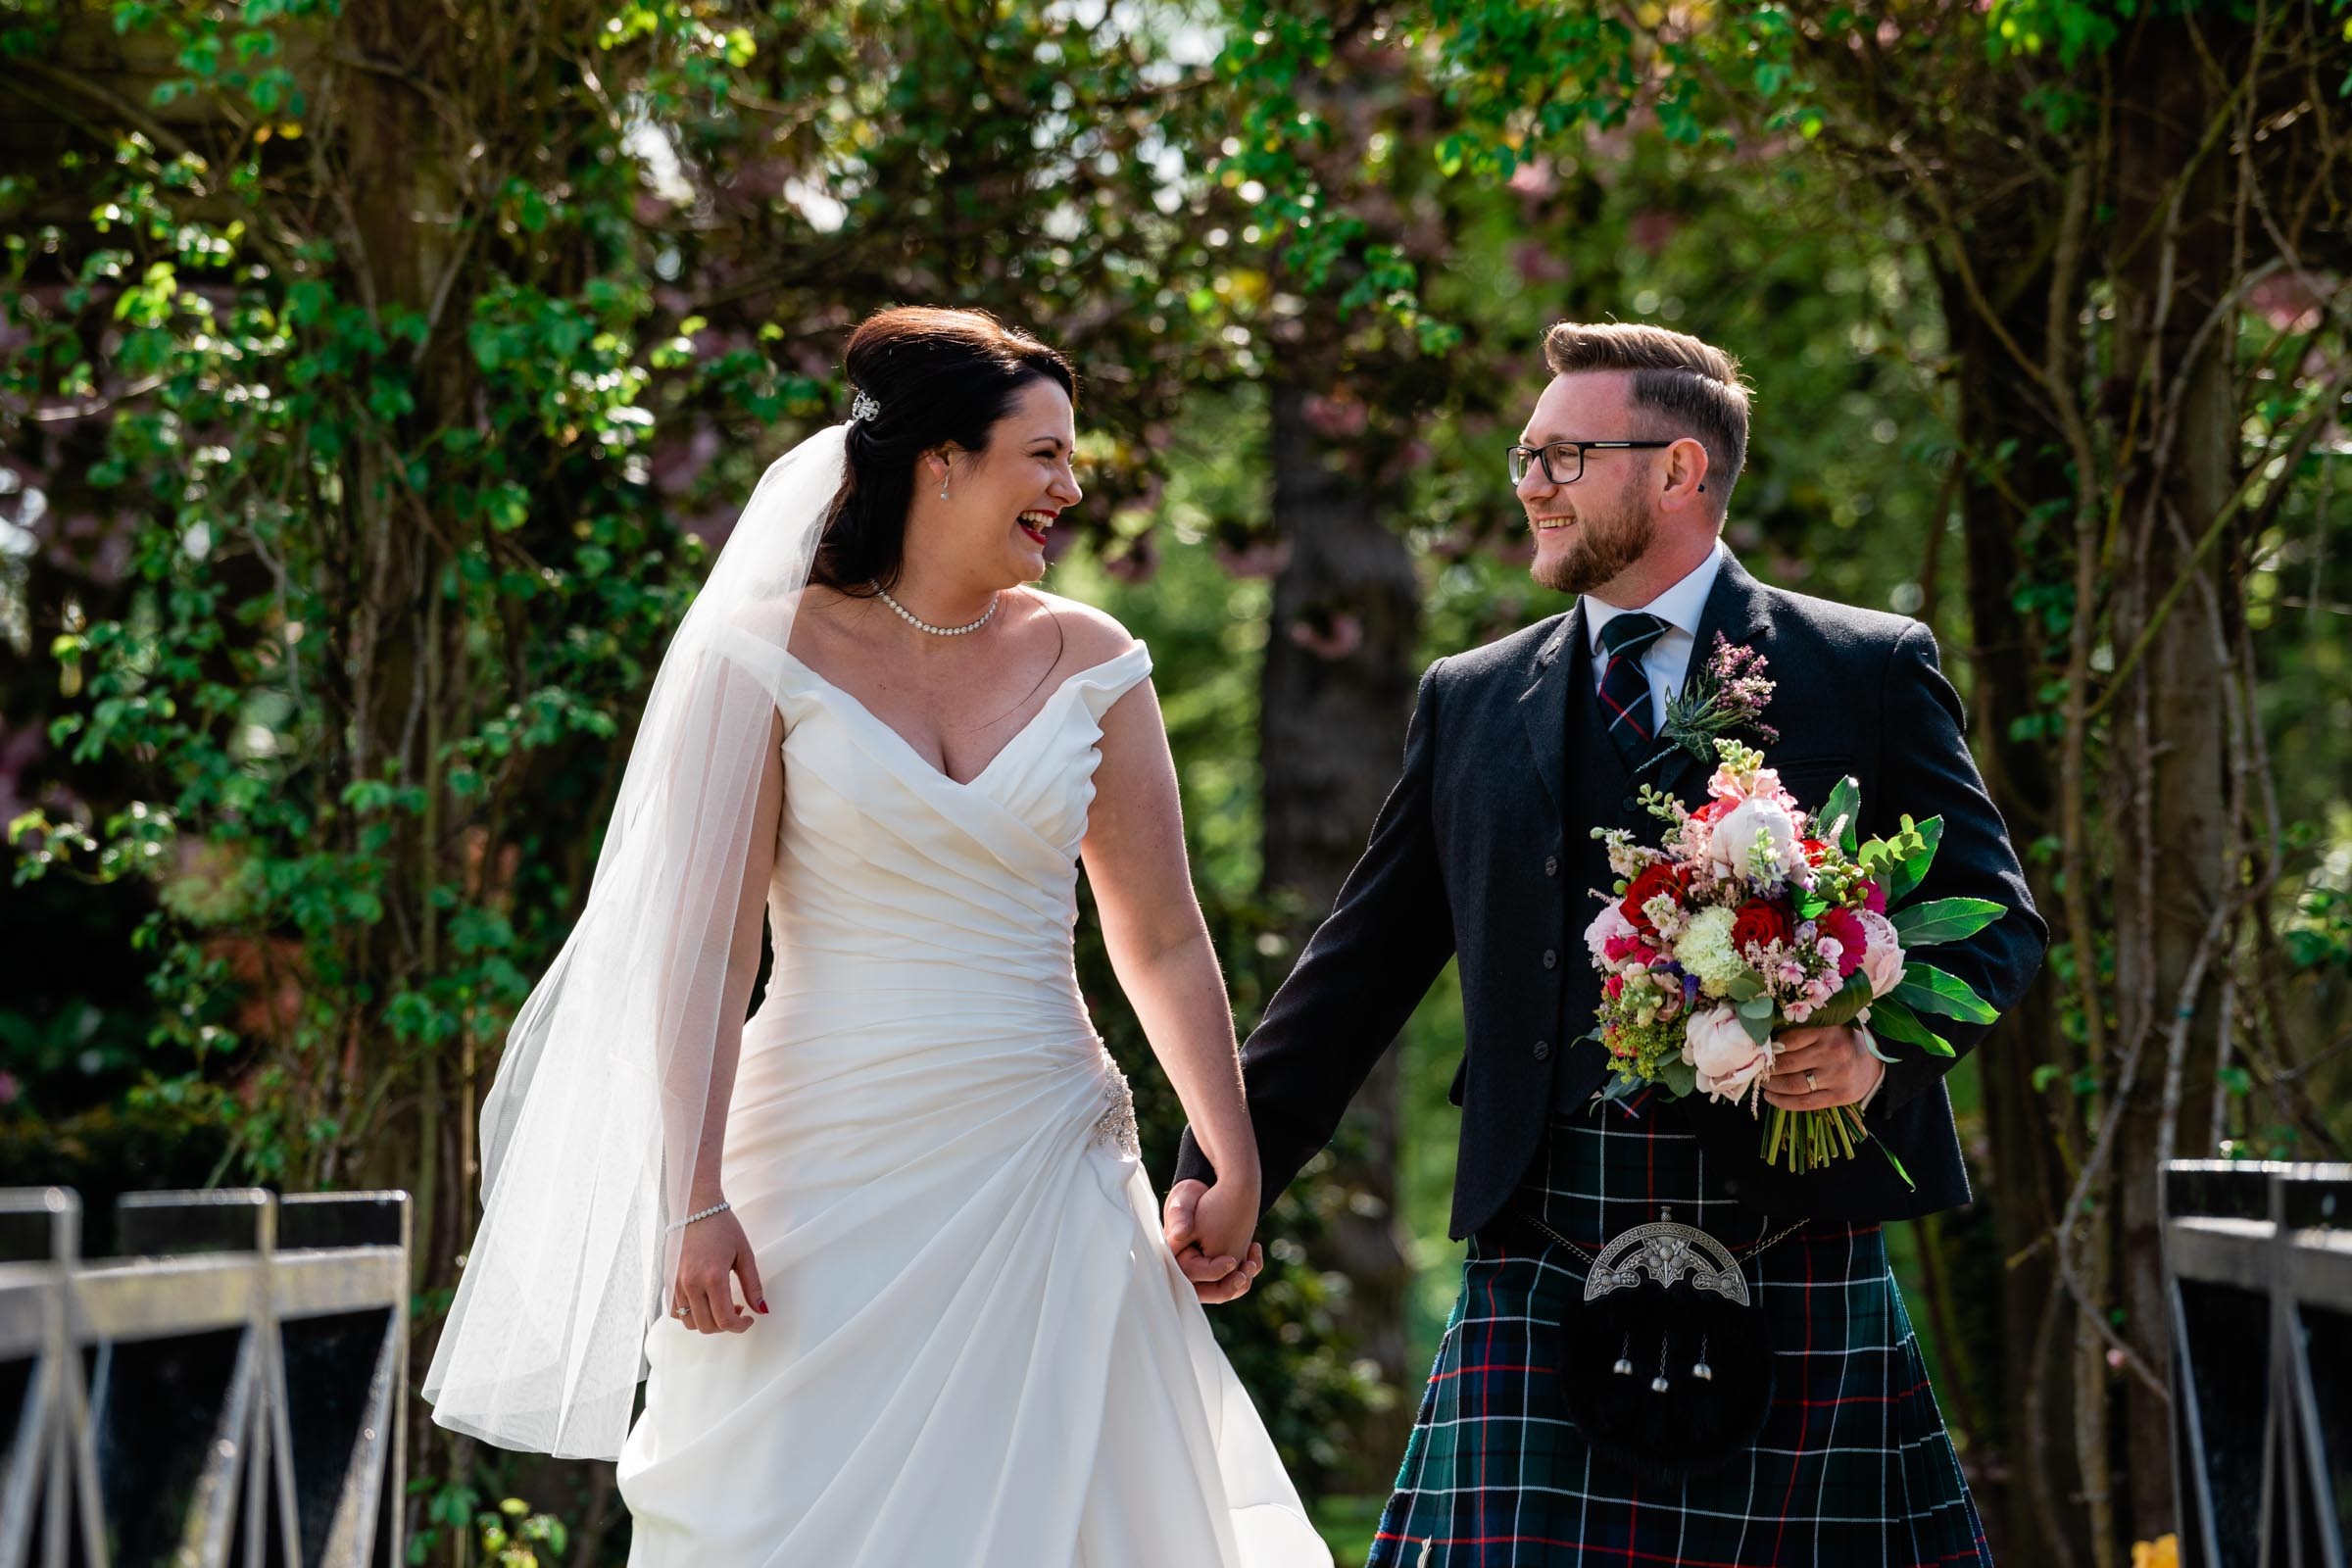 western-house-hotel-ayrshire-wedding-dearlyphotography (16 of 19).jpg